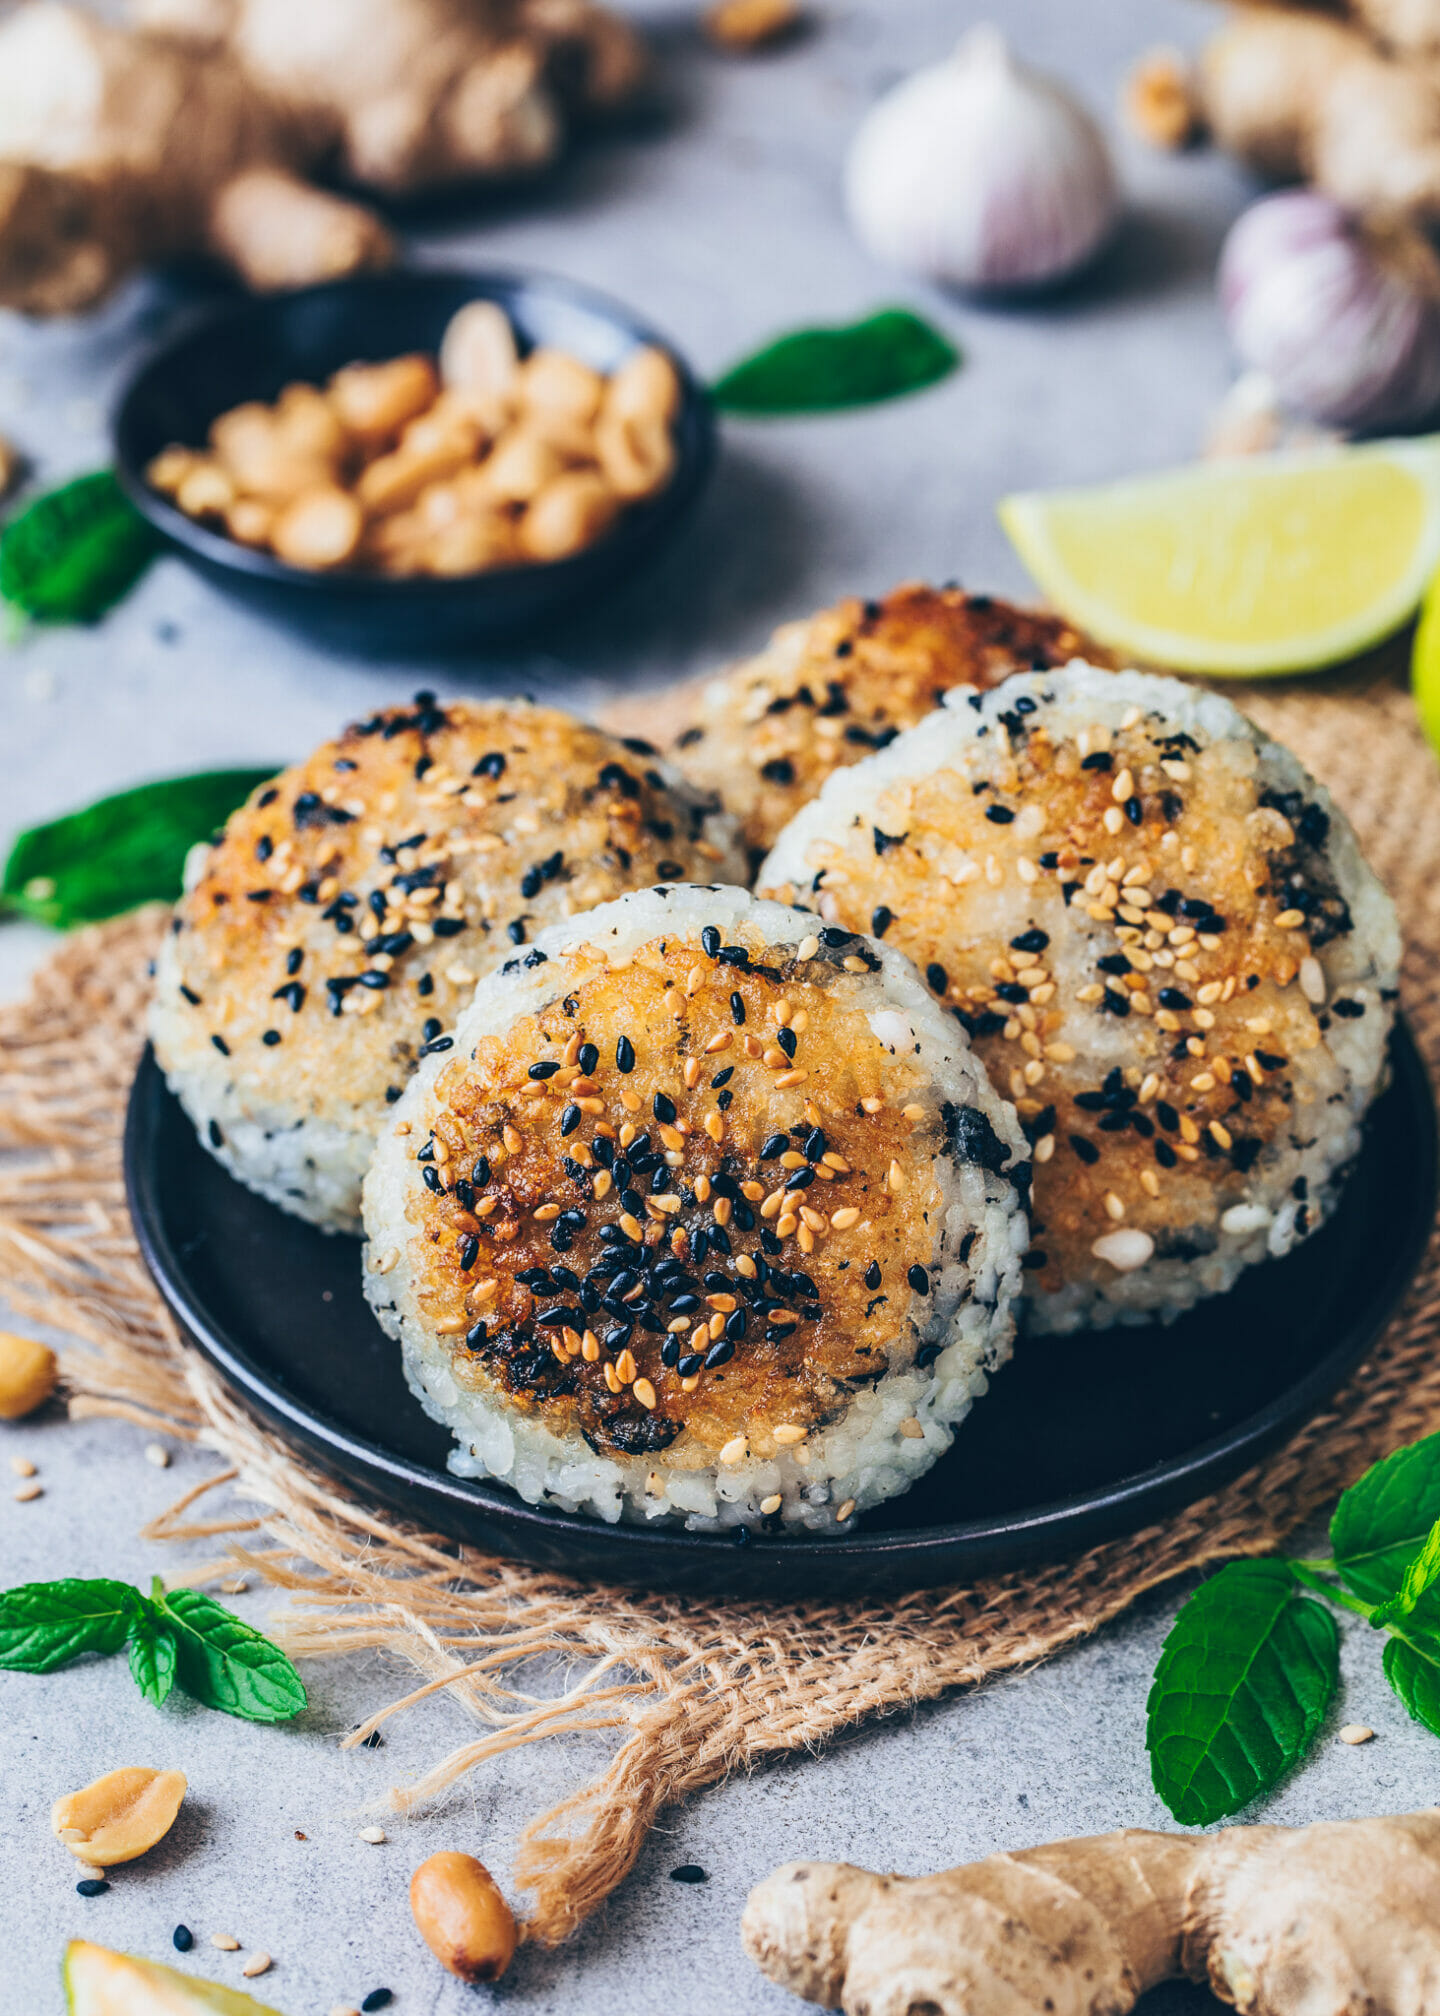 Yaki Onigiri, Japanese Crispy Grilled Rice Balls